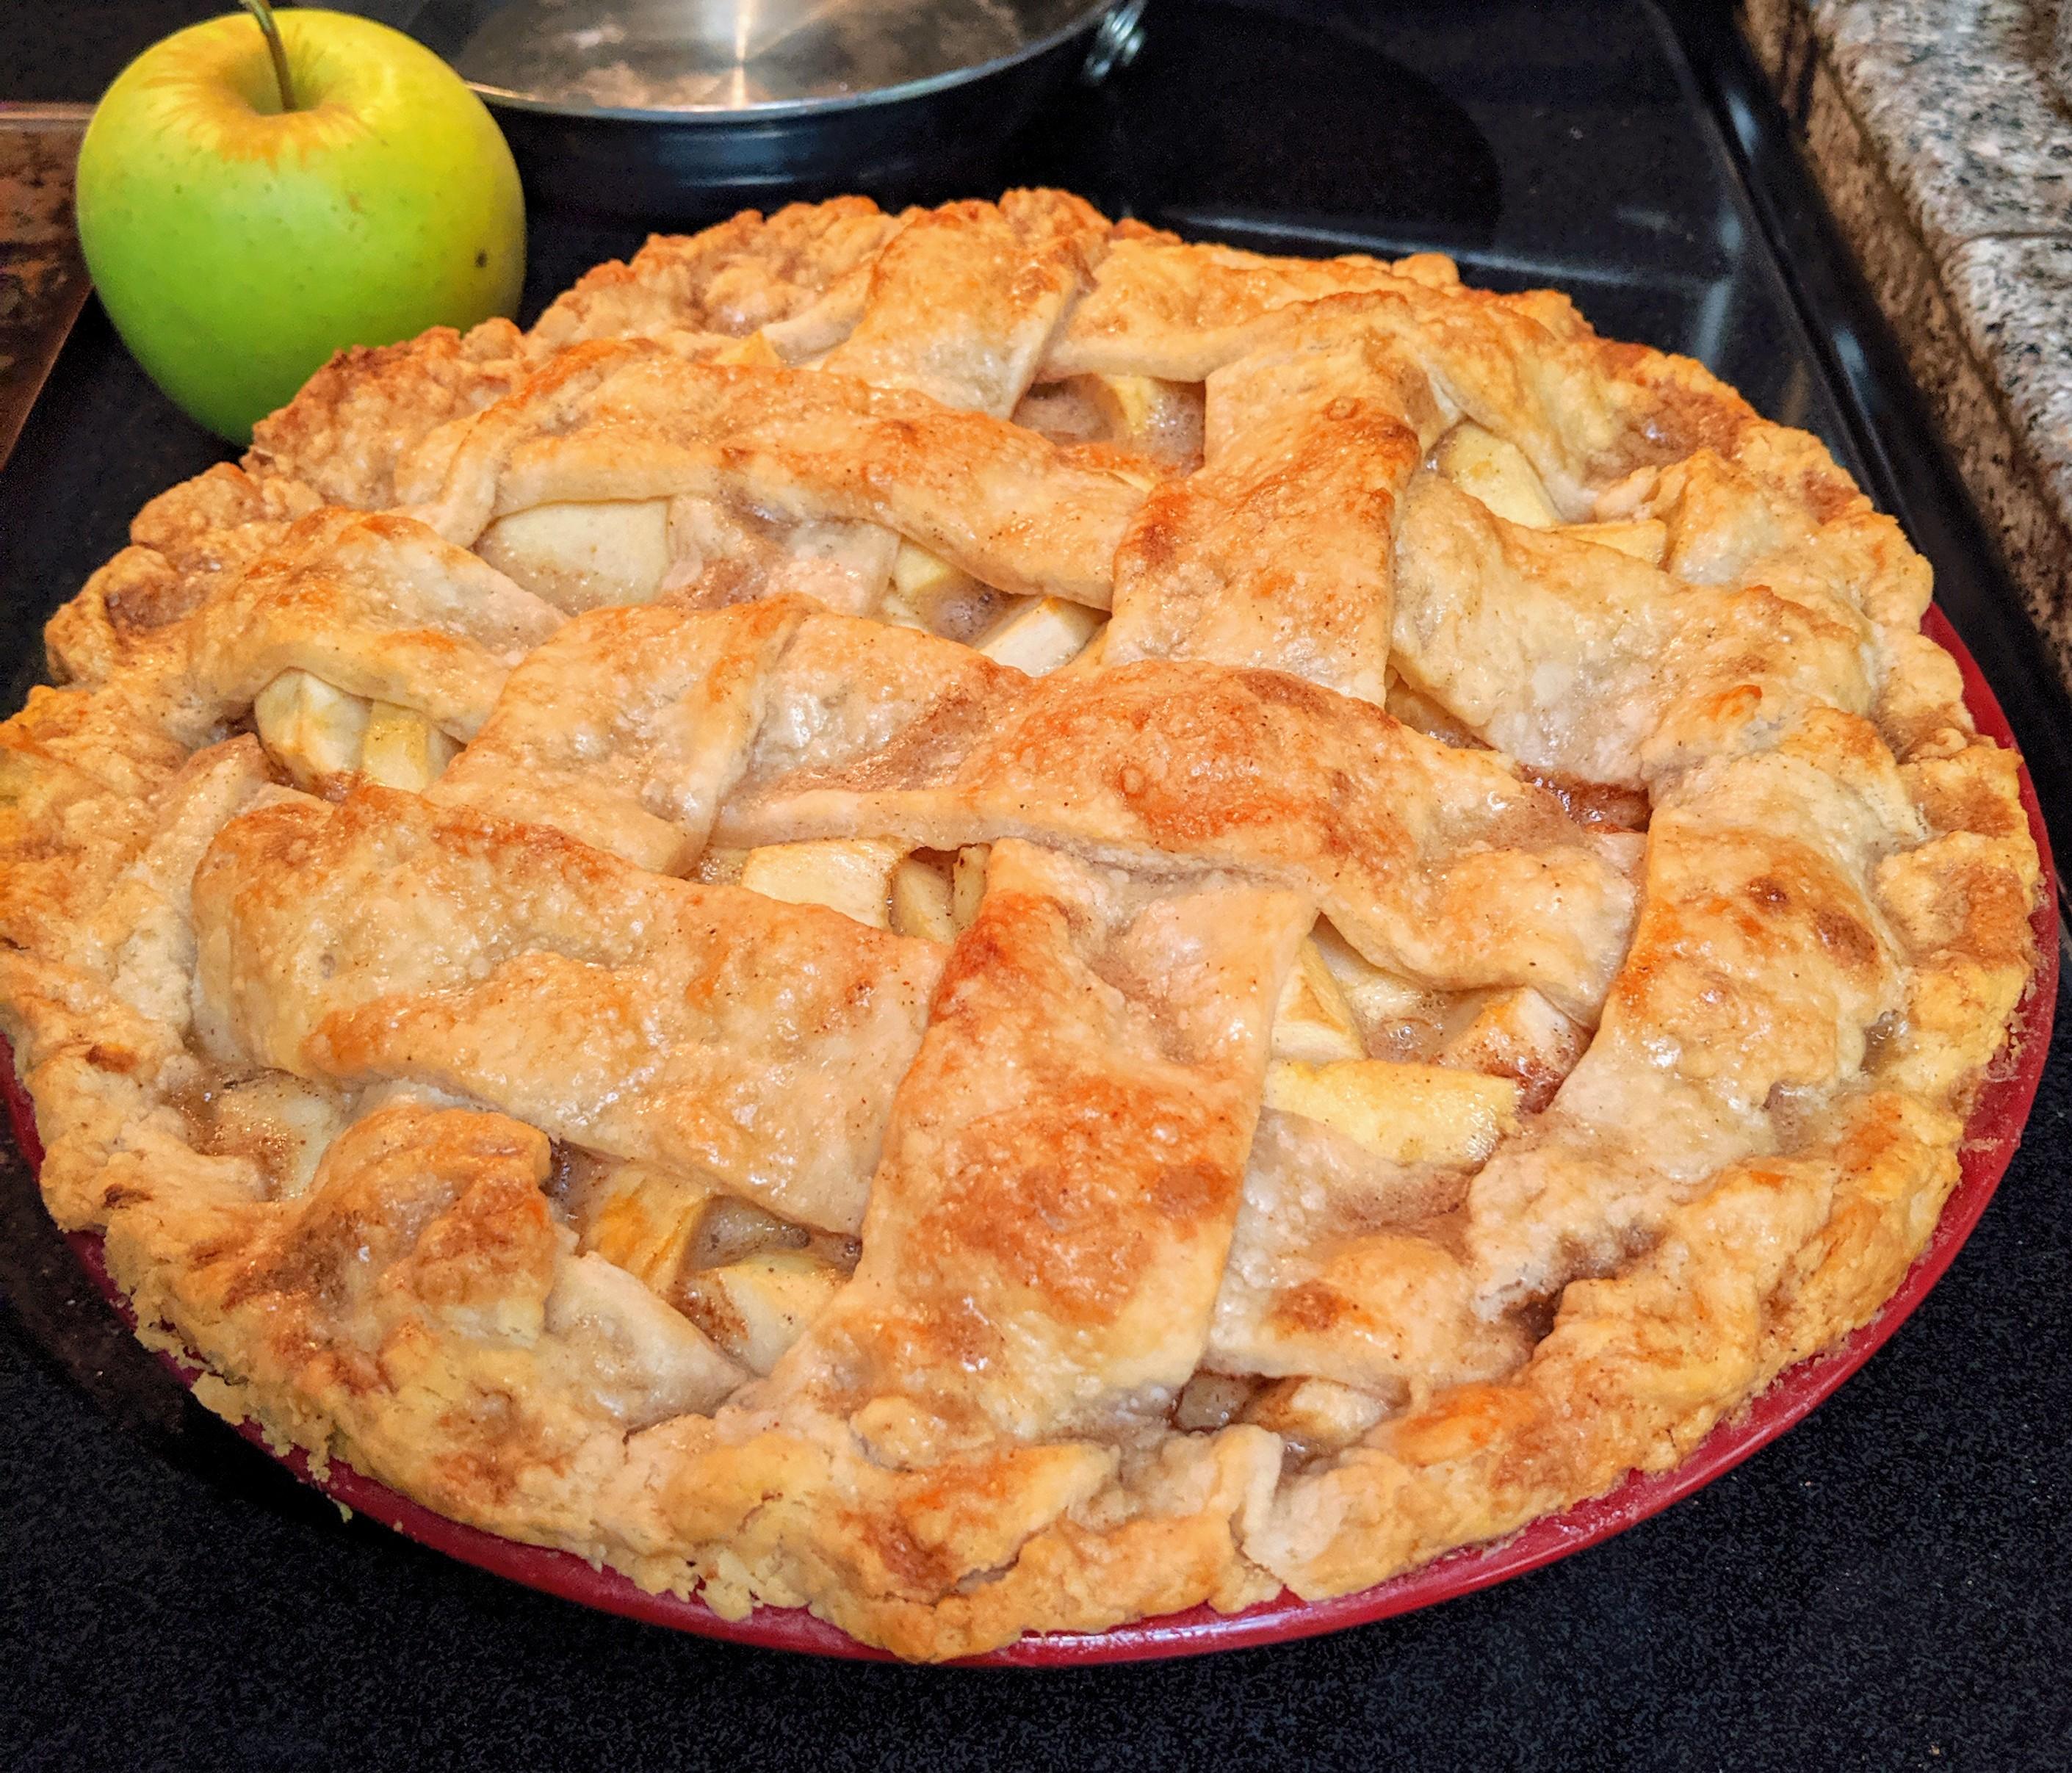 Chef John's Caramel Apple Pie Tim Dougherty